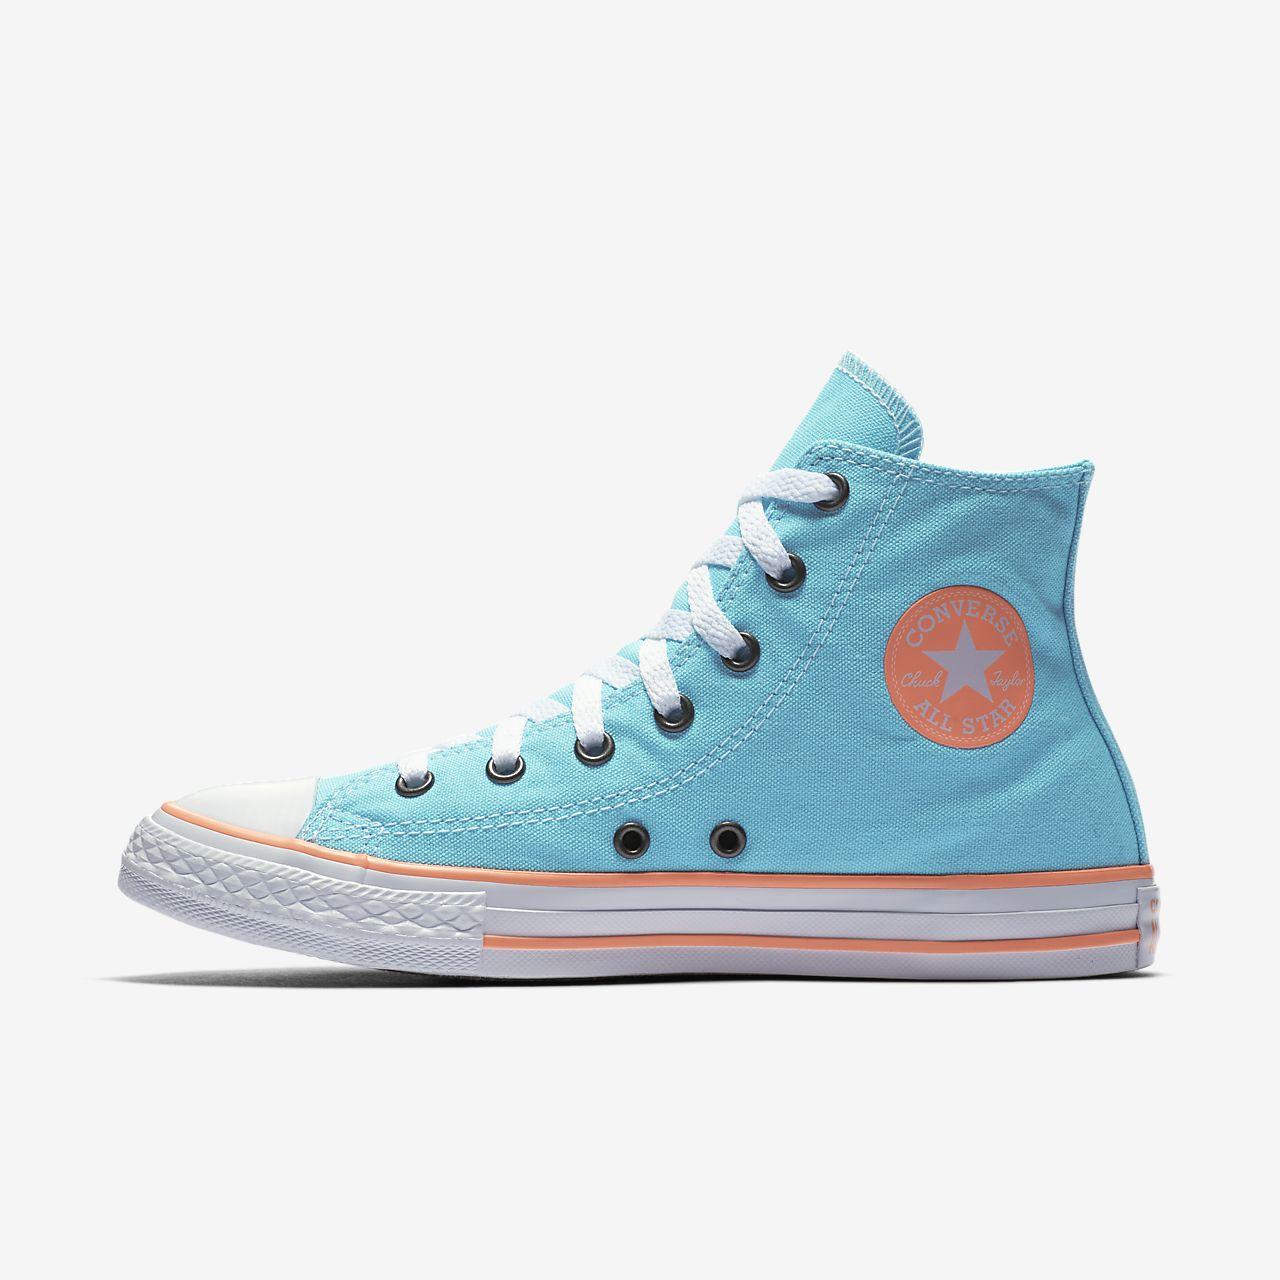 f6f356a083c7 Converse Chuck Taylor All Star High Top Little Big Kids  Shoe. Nike.com